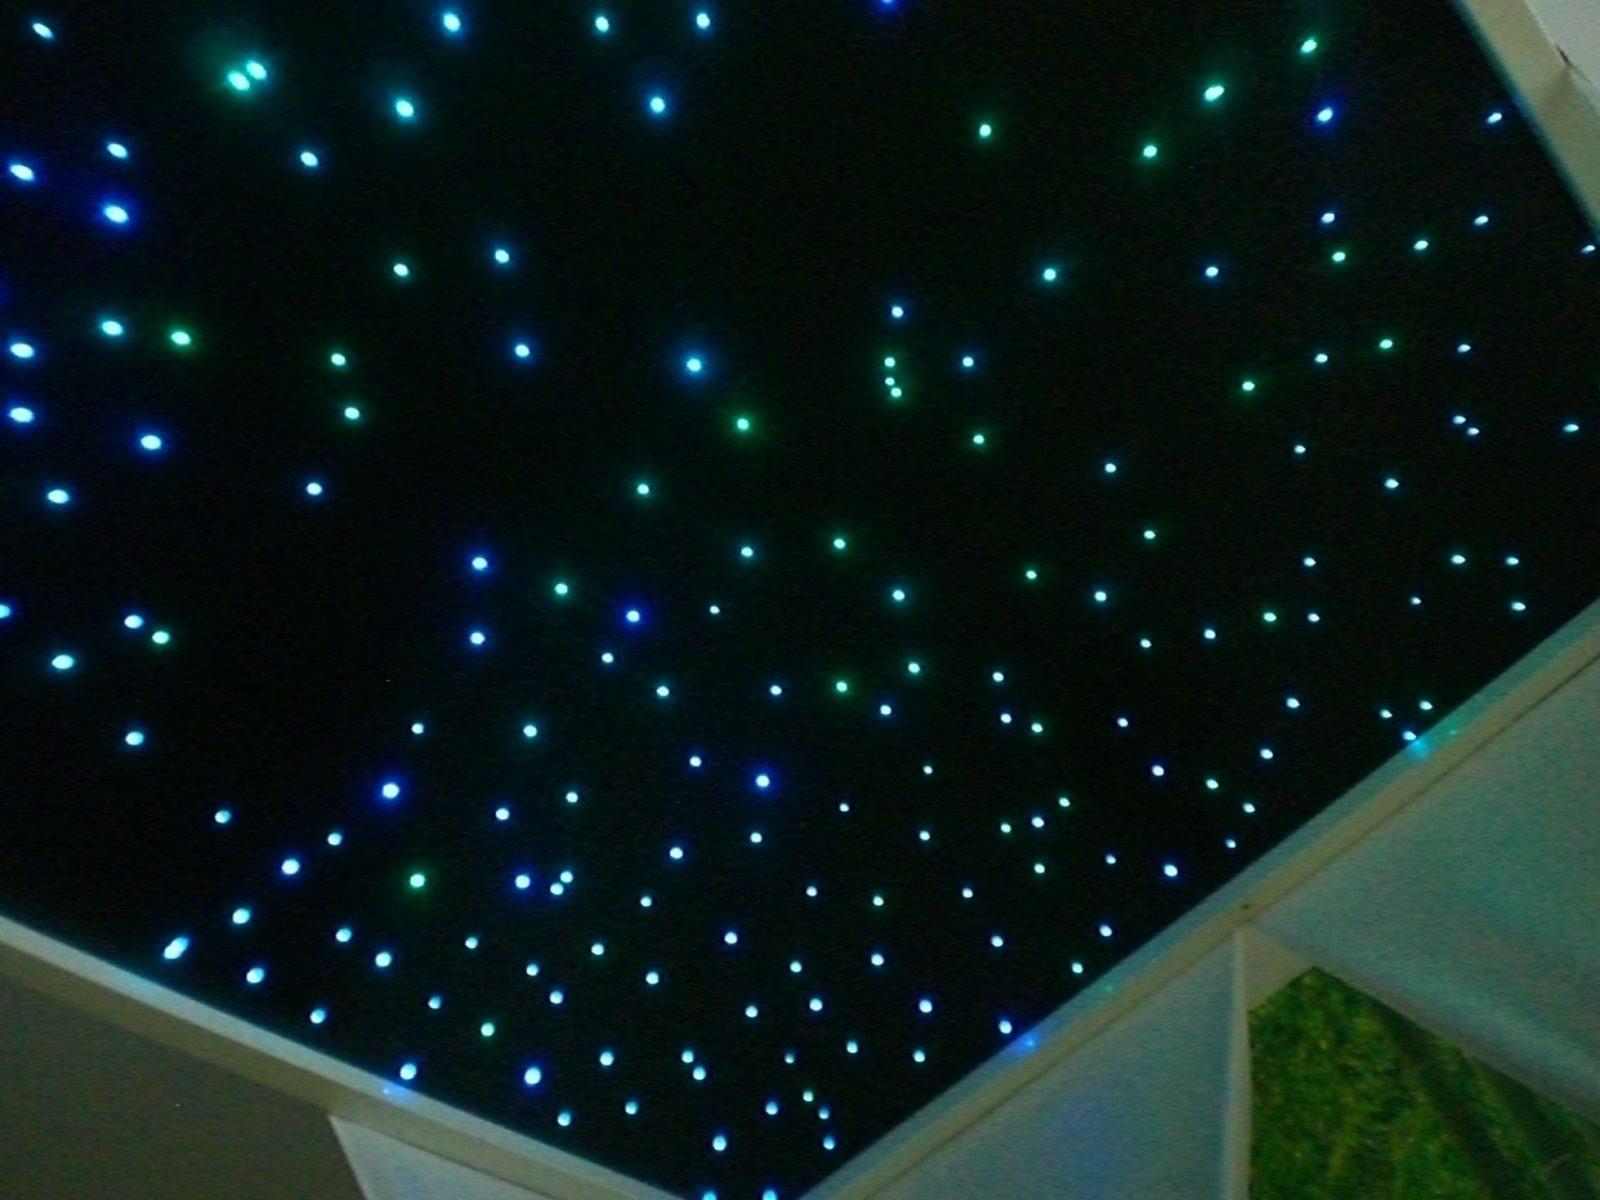 Bauanleitung Ledsternenhimmel  Sternenhimmel Kinderzimmer Und von Sternenhimmel Selber Bauen Glasfaser Bild